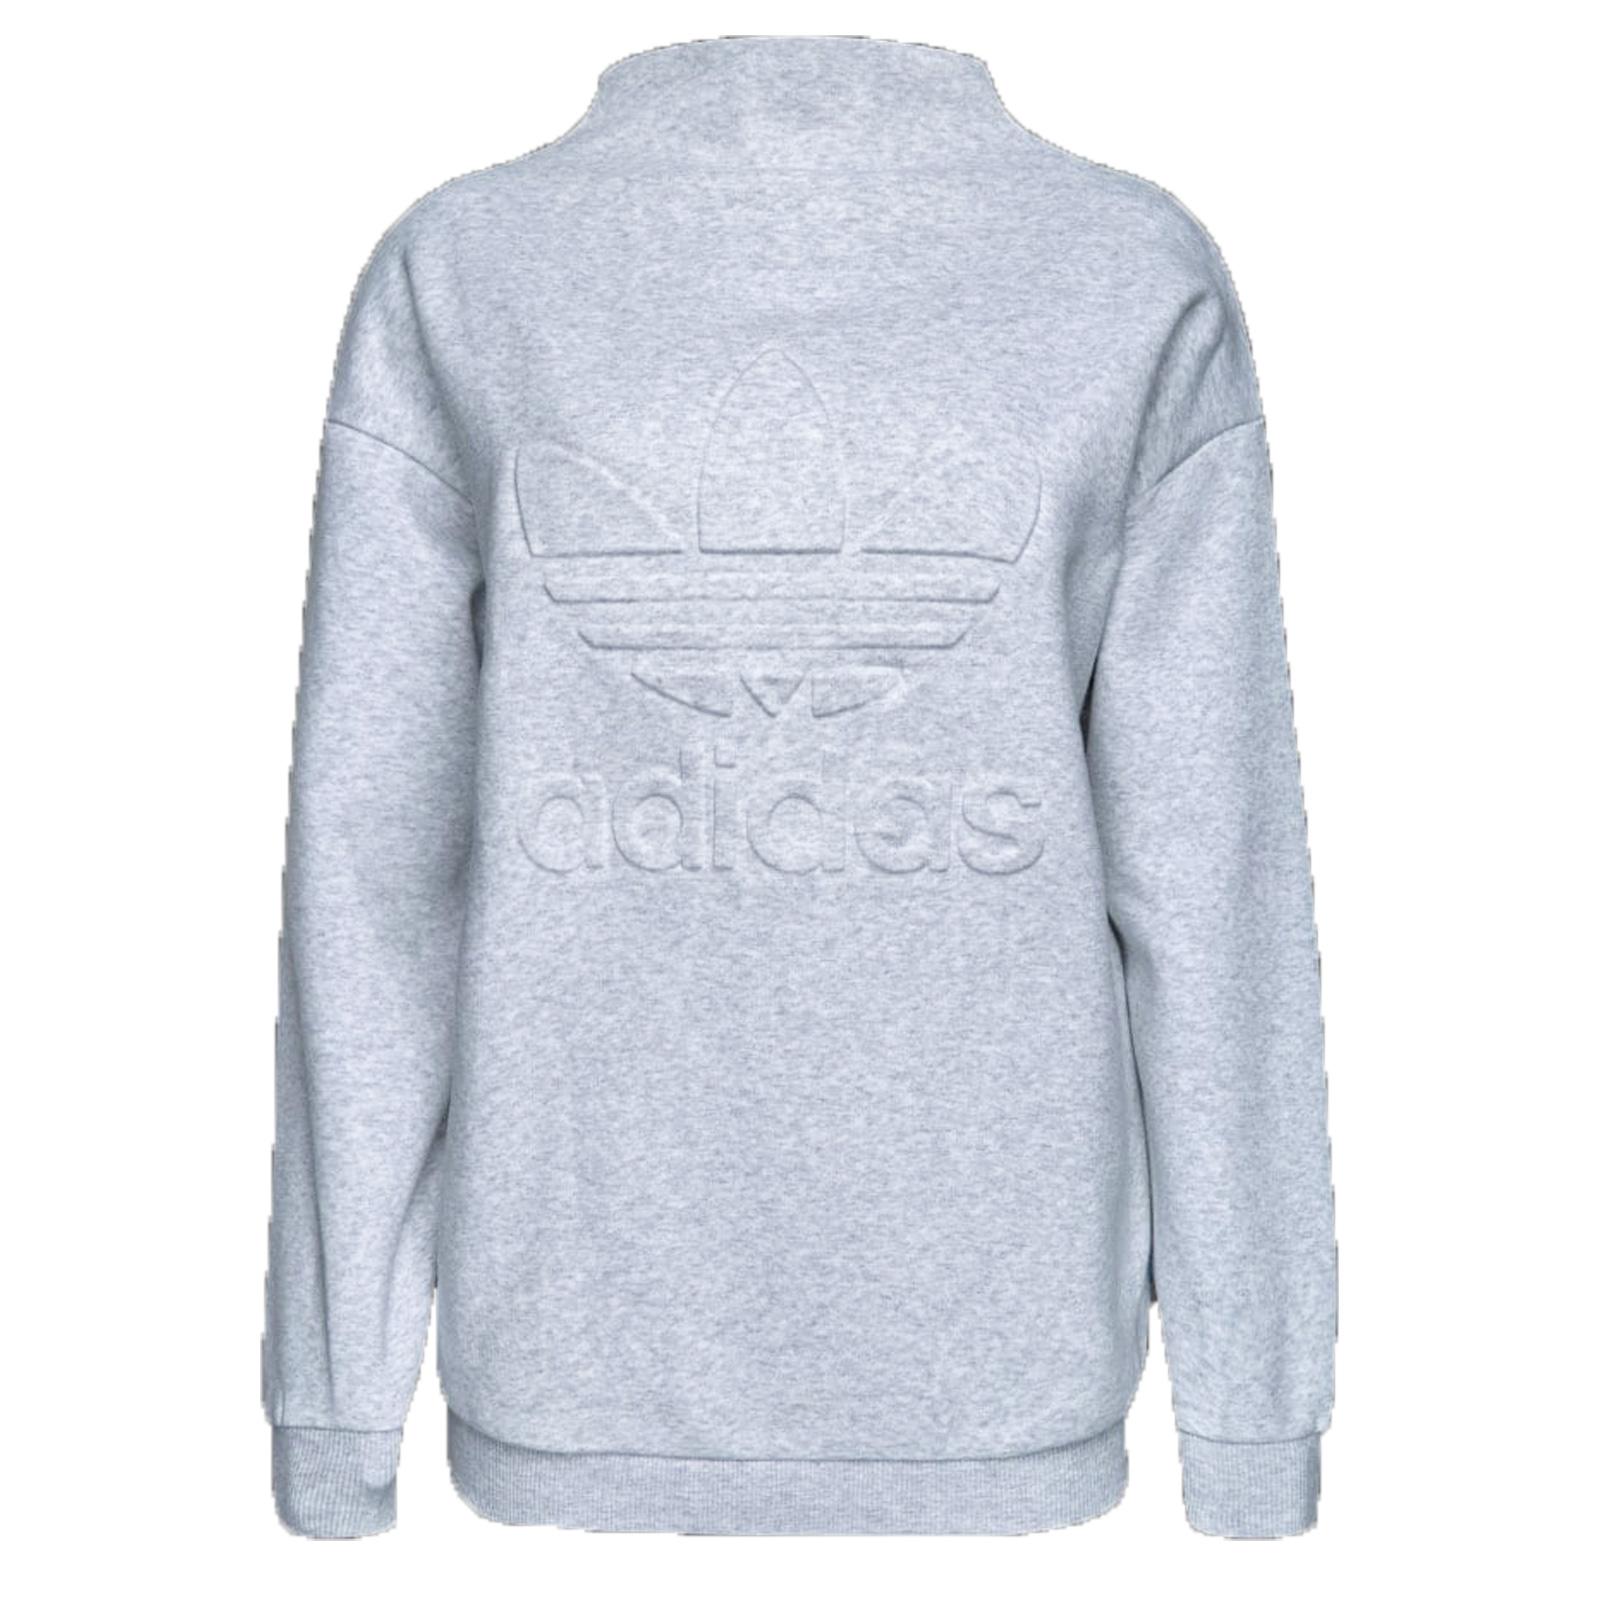 79a629912a2a3 adidas Originals Trefoil NY New York Fleece Damen Sweatshirt kuschelig Grau